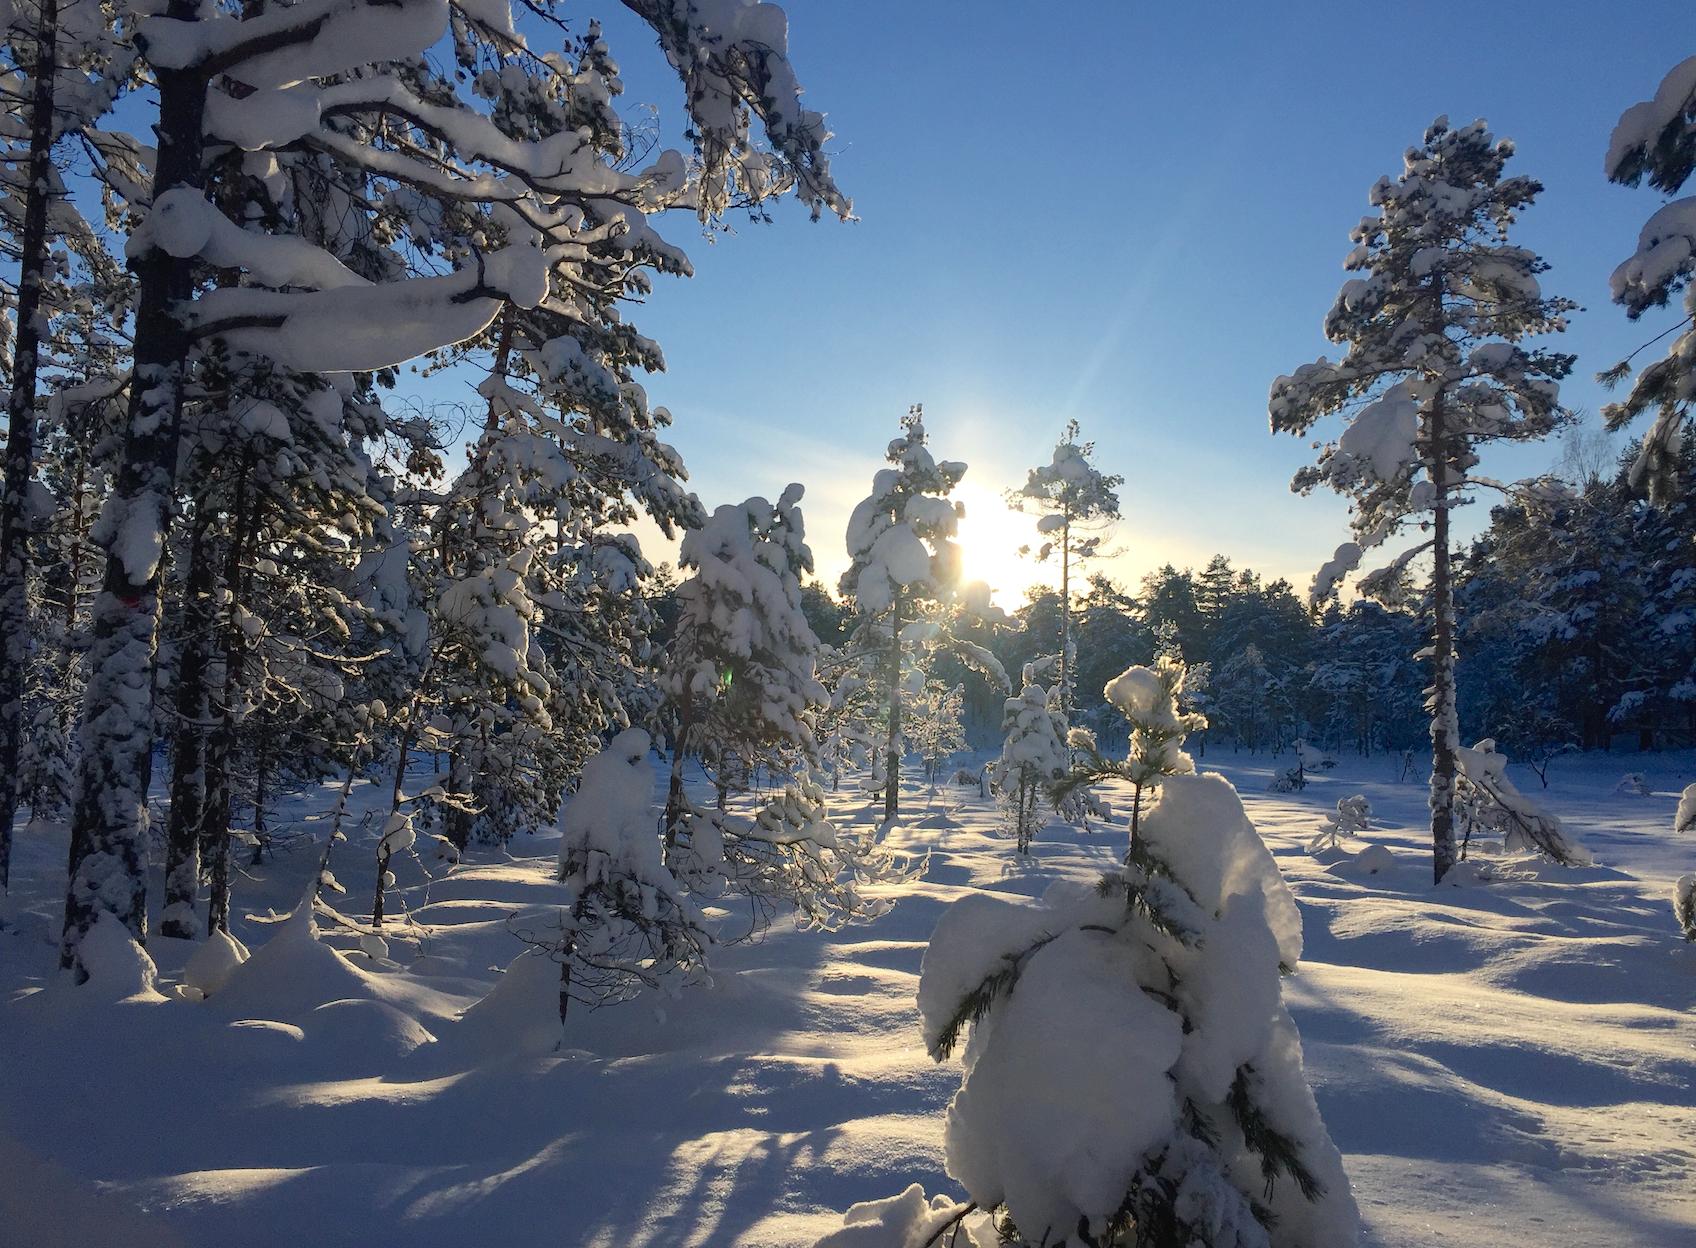 Kjekstadmarka januar 2016.